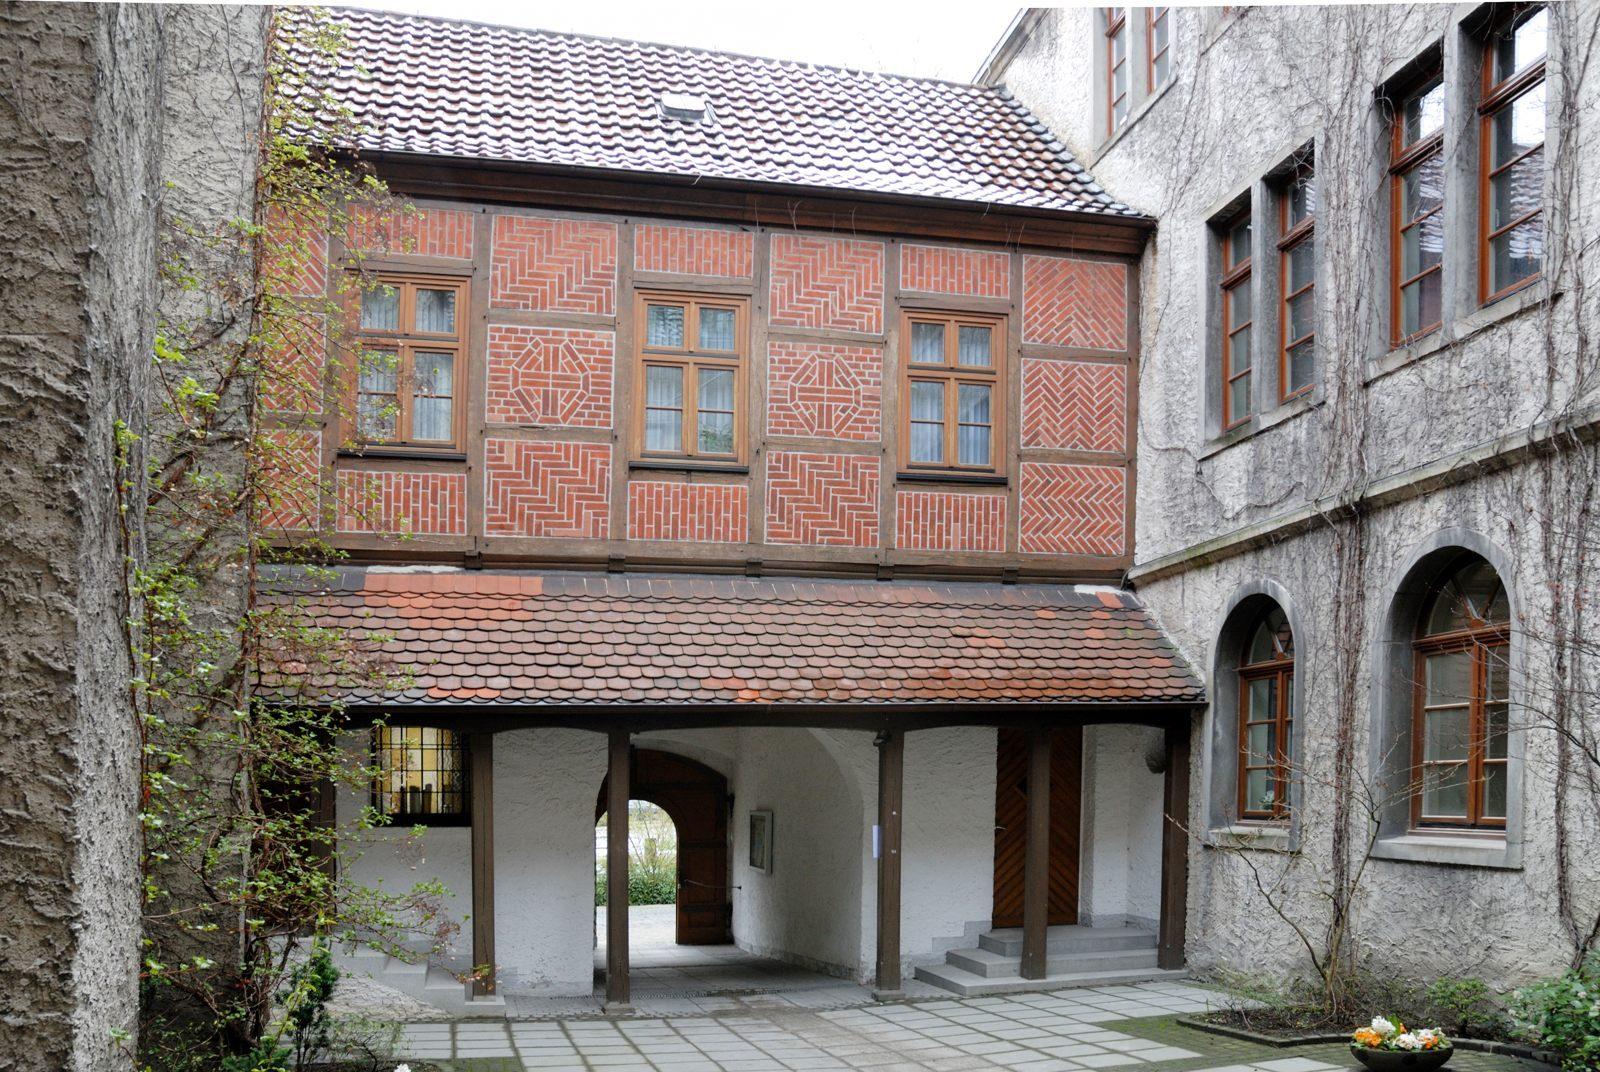 2008 Klosterhof_1600